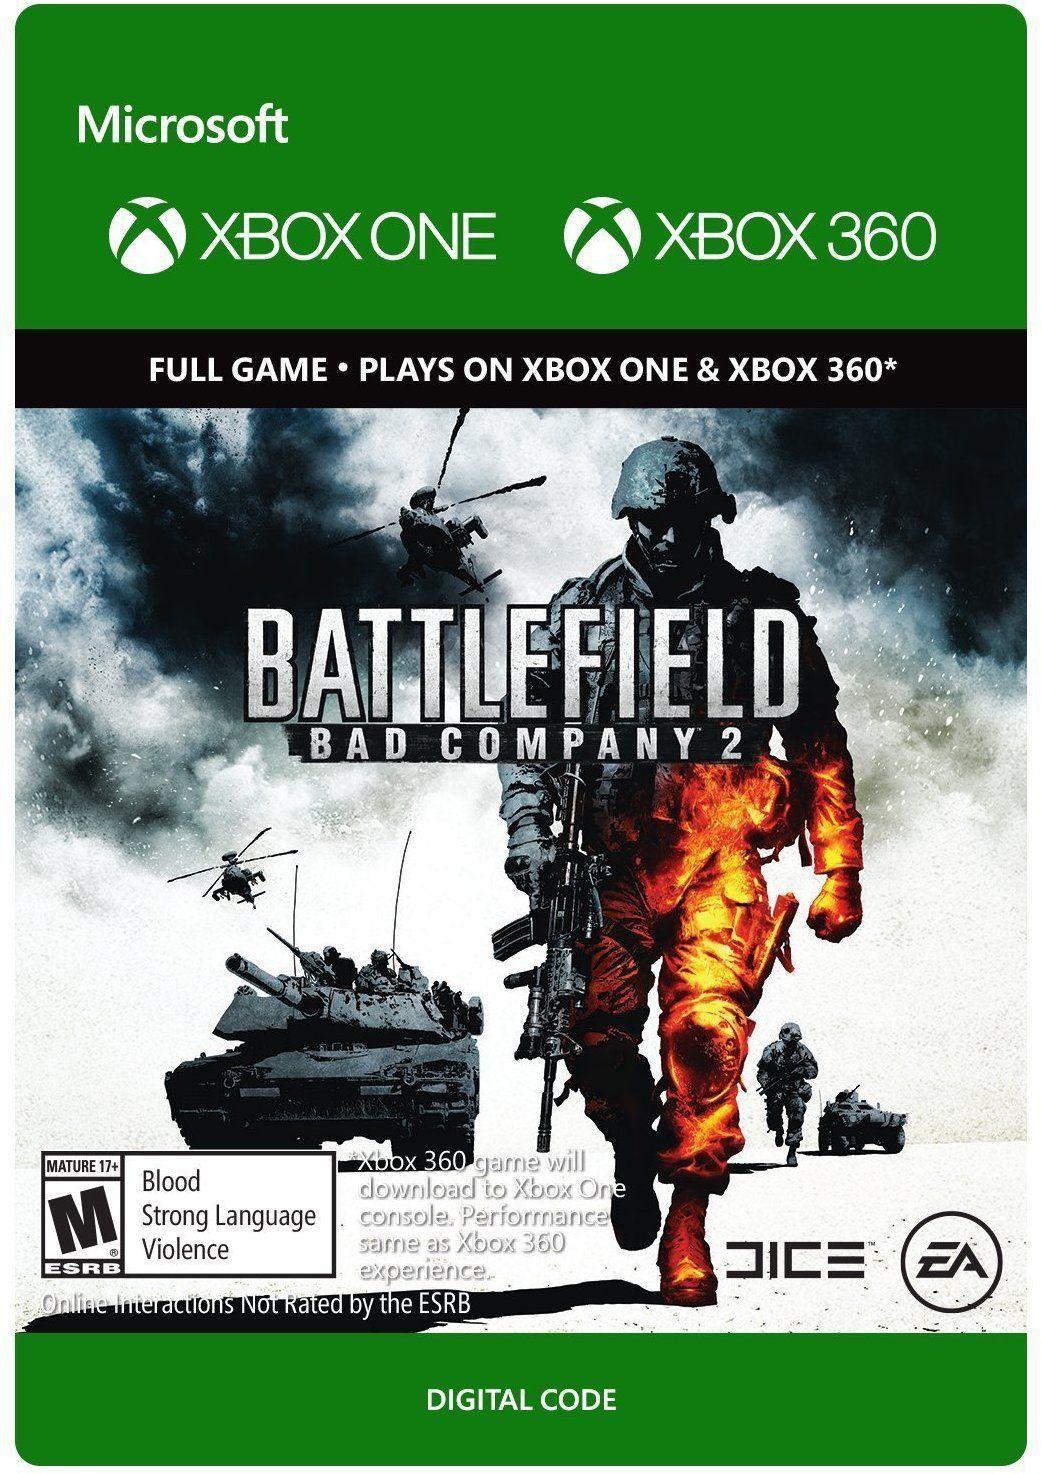 Battlefield Bad Company 2 Digital Xbox One 360 Download 4 99 Https T Co X6ggca7ikj Slickdeals Battlefield Bad Company Xbox One Battlefield Bad Company 2